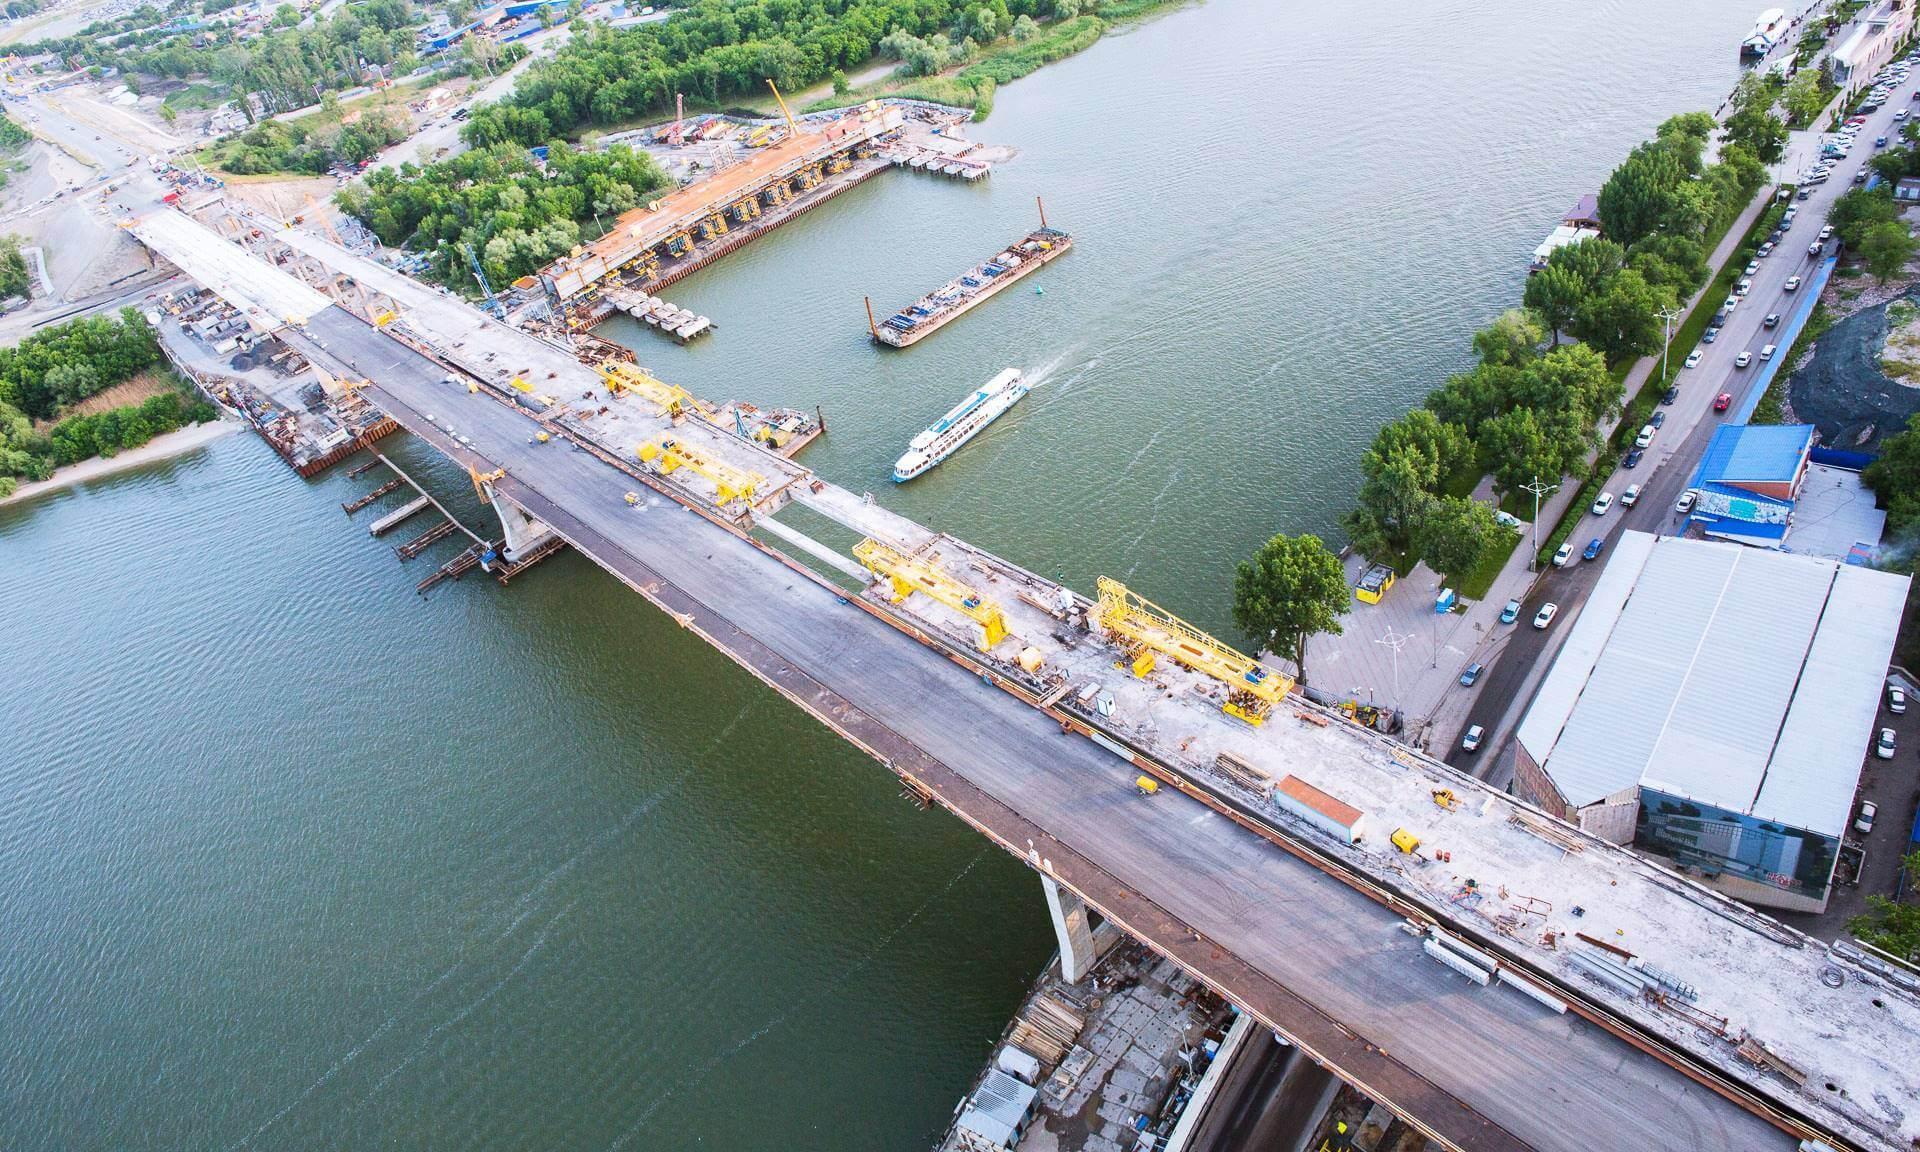 Rostov-on-don Voroshilovsky bridge